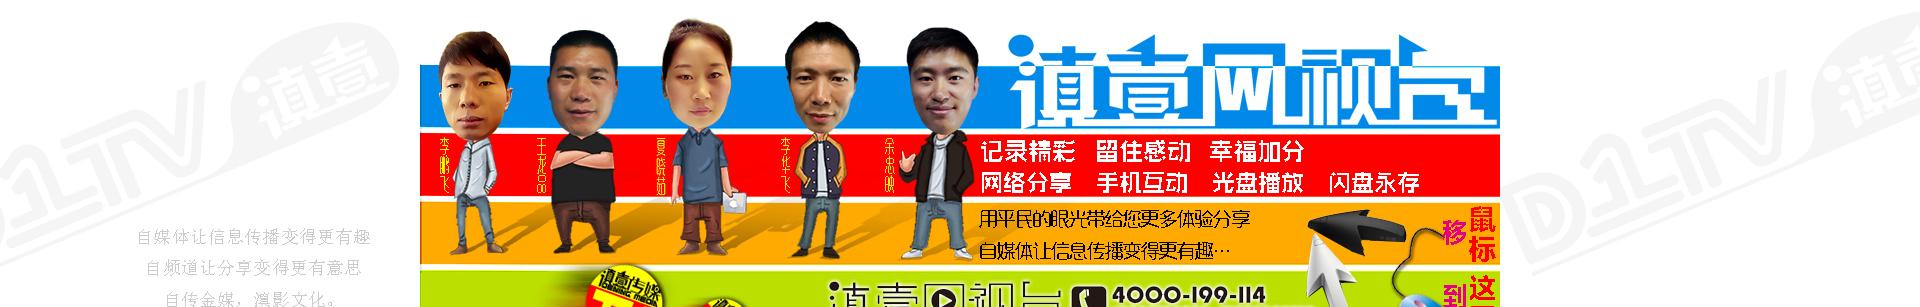 滇壹网视台 banner